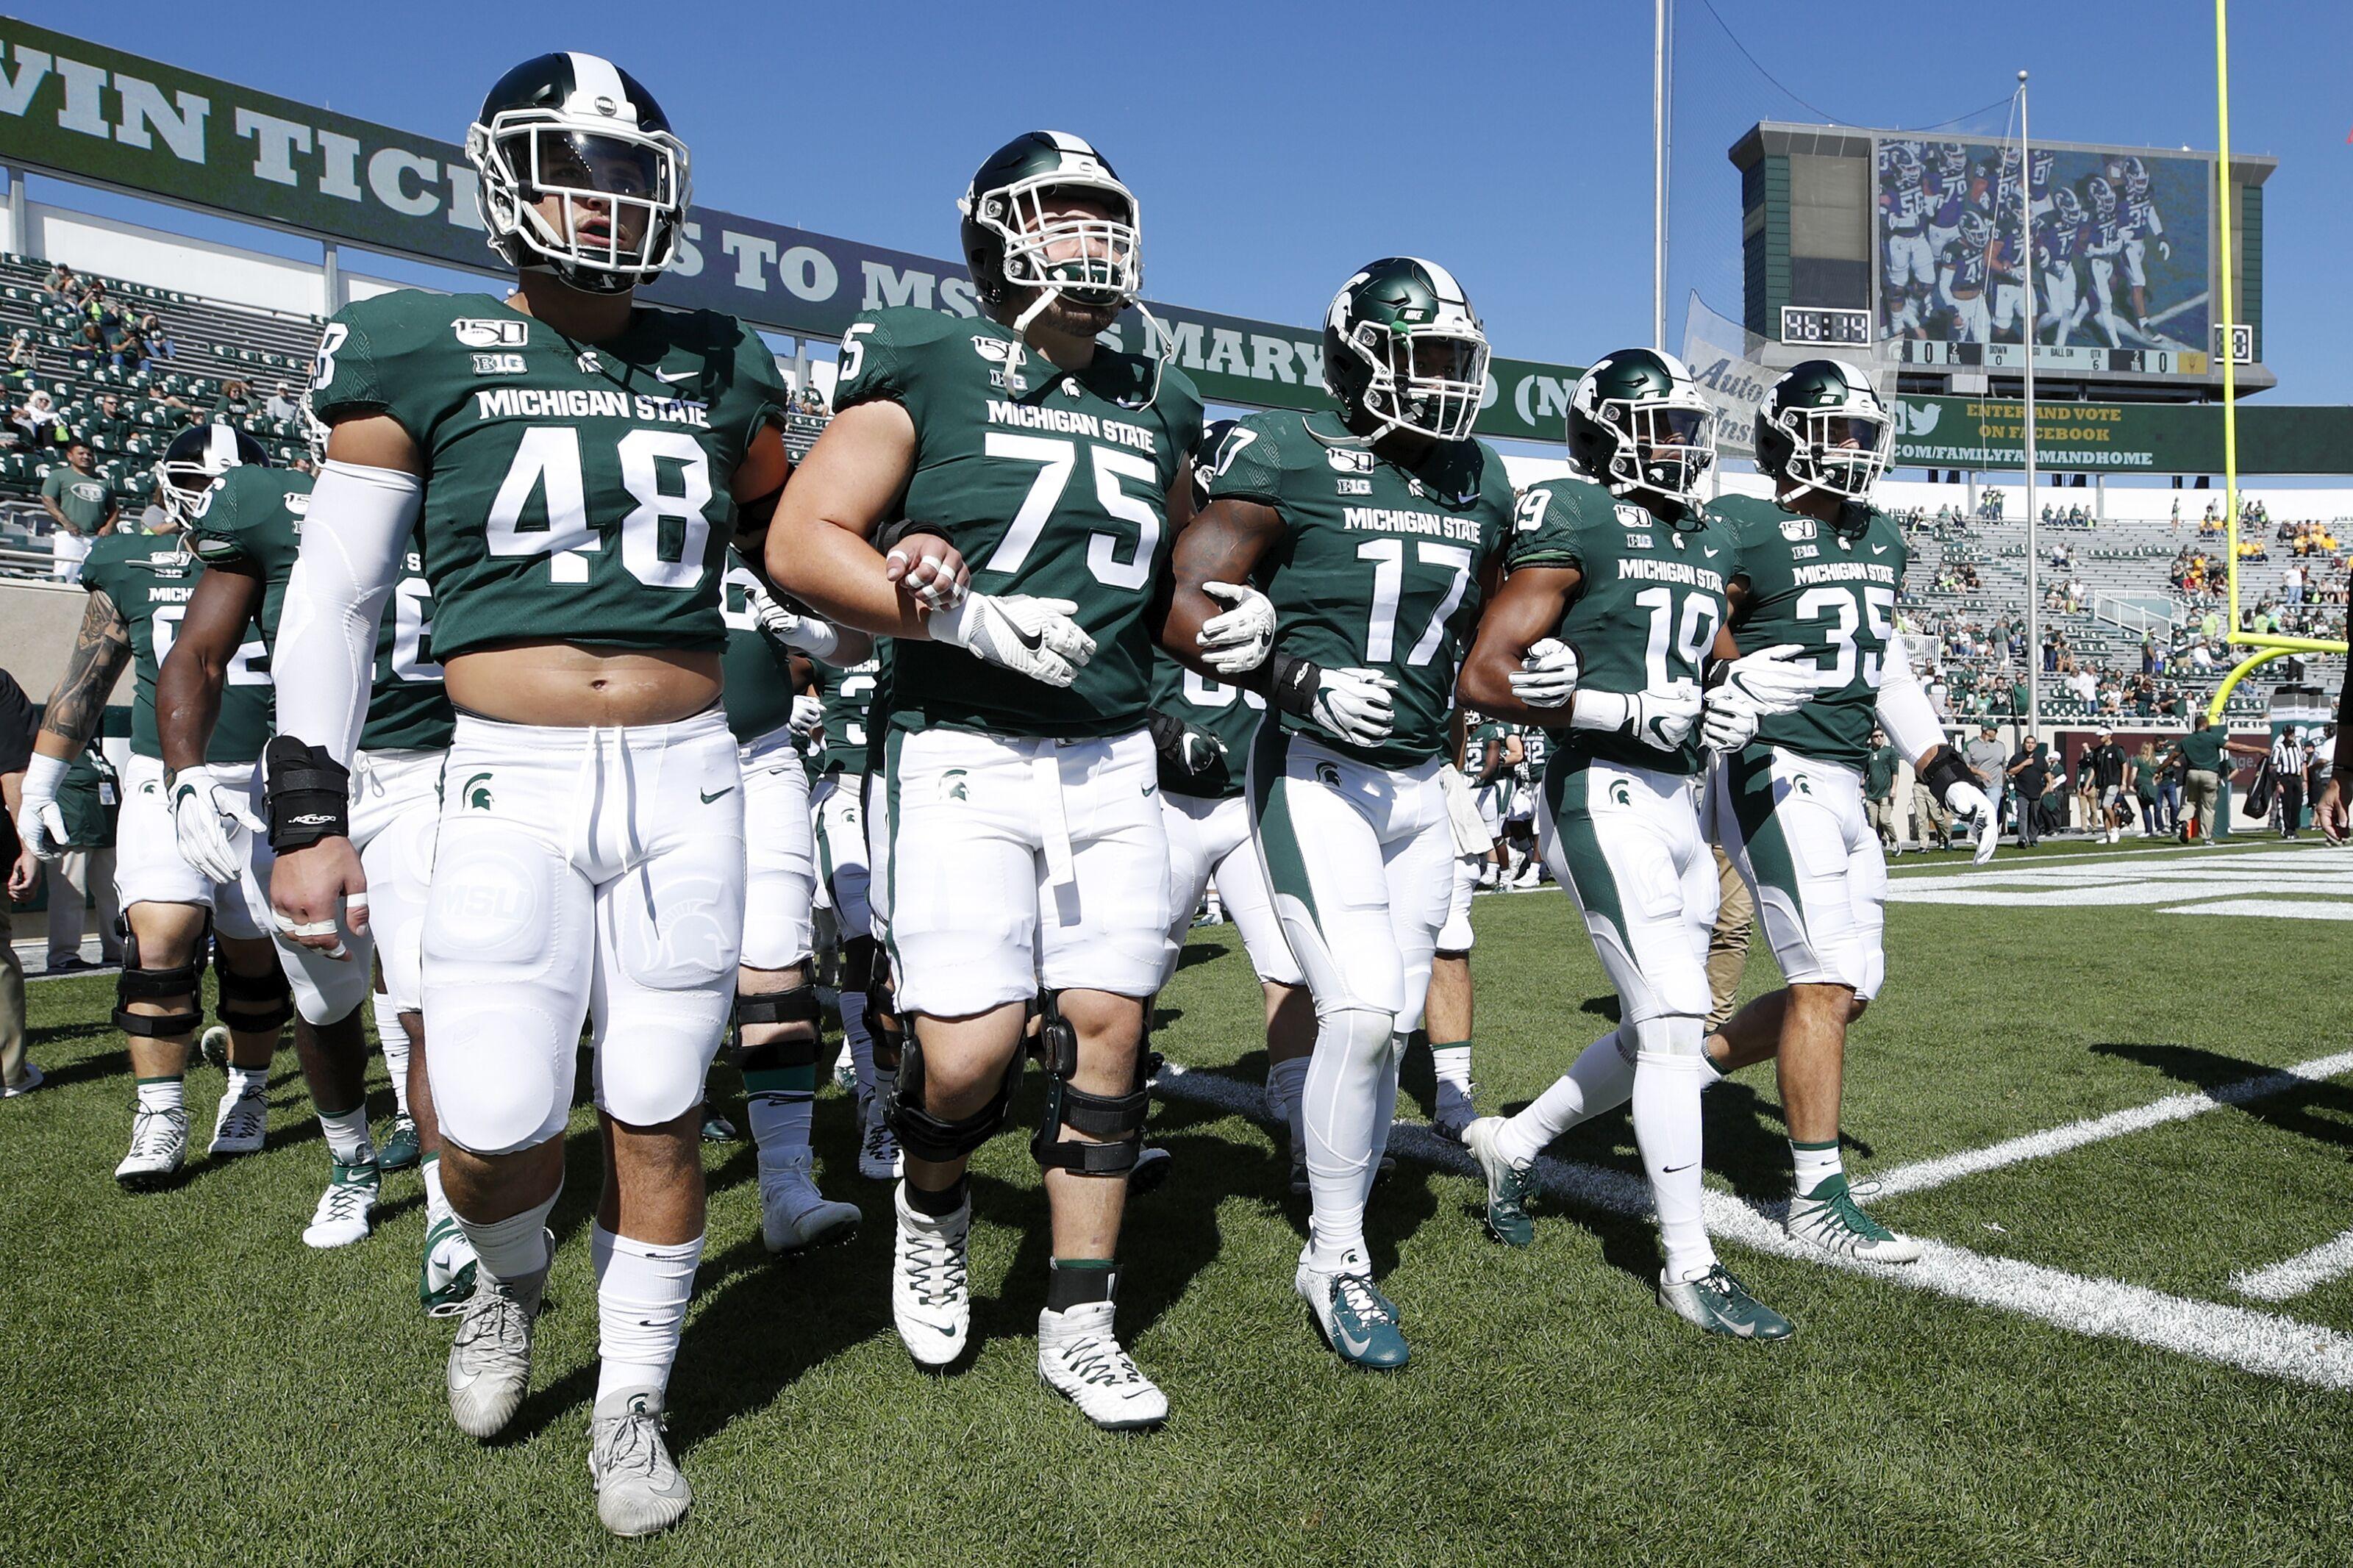 Michigan State Football: 3 reasons Spartans will beat Northwestern in Week 4